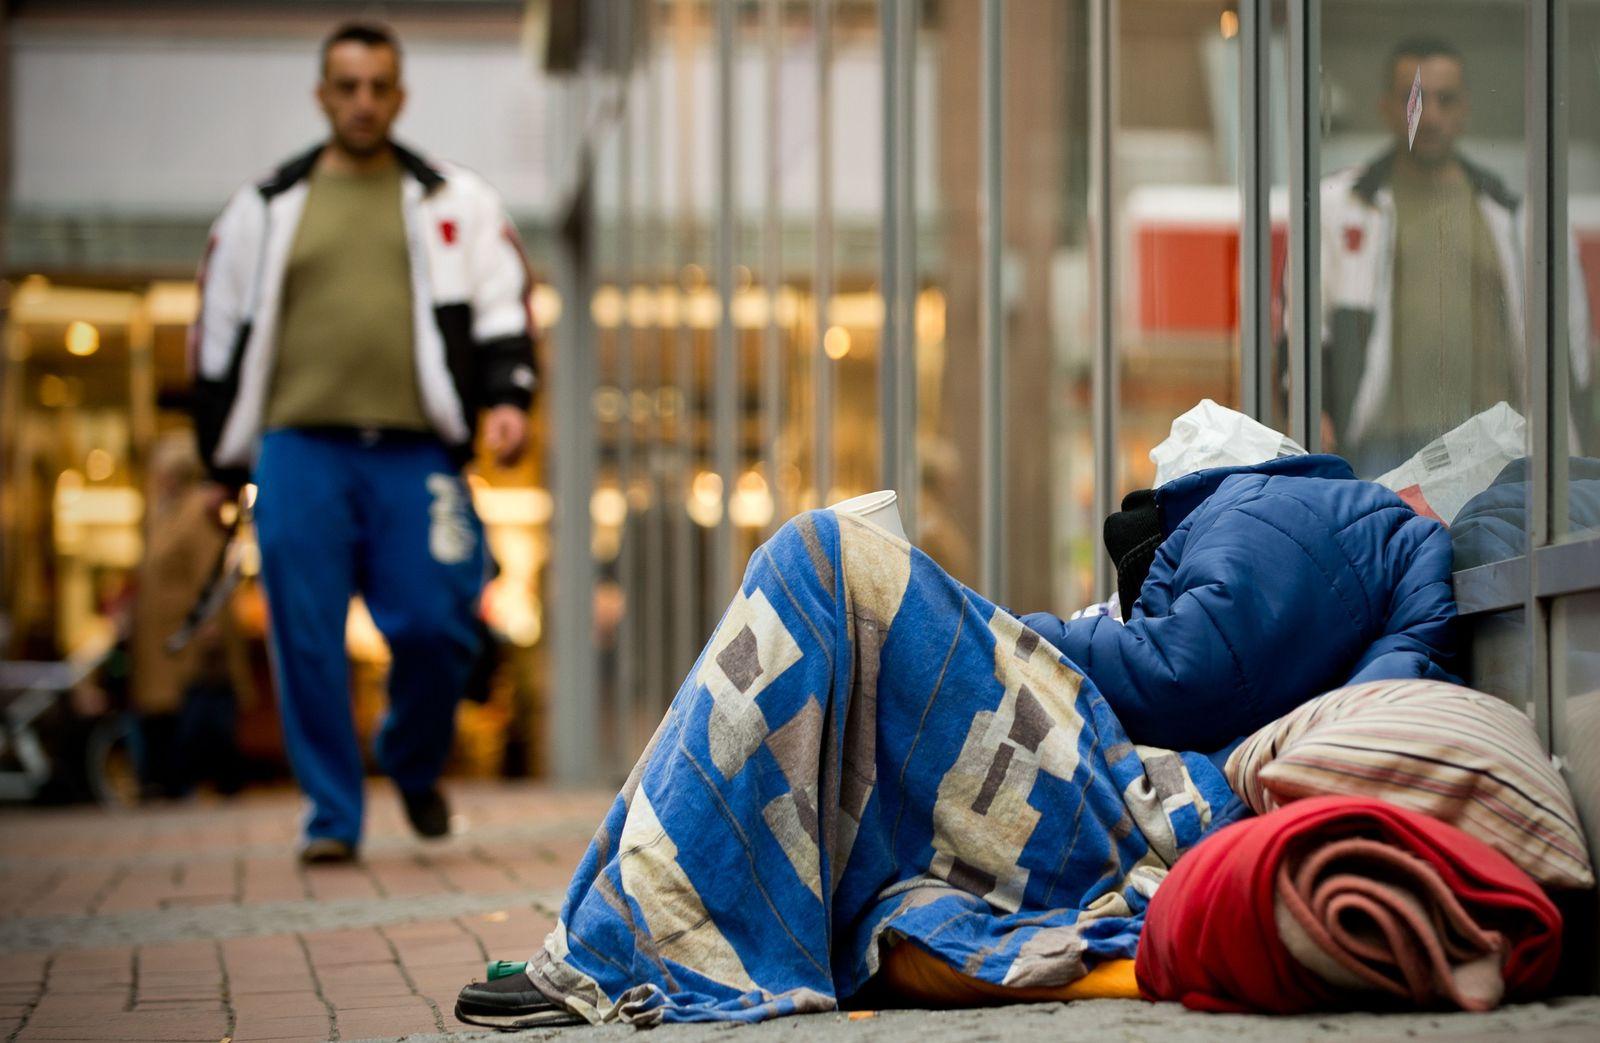 Dortmund/ Obdachloser